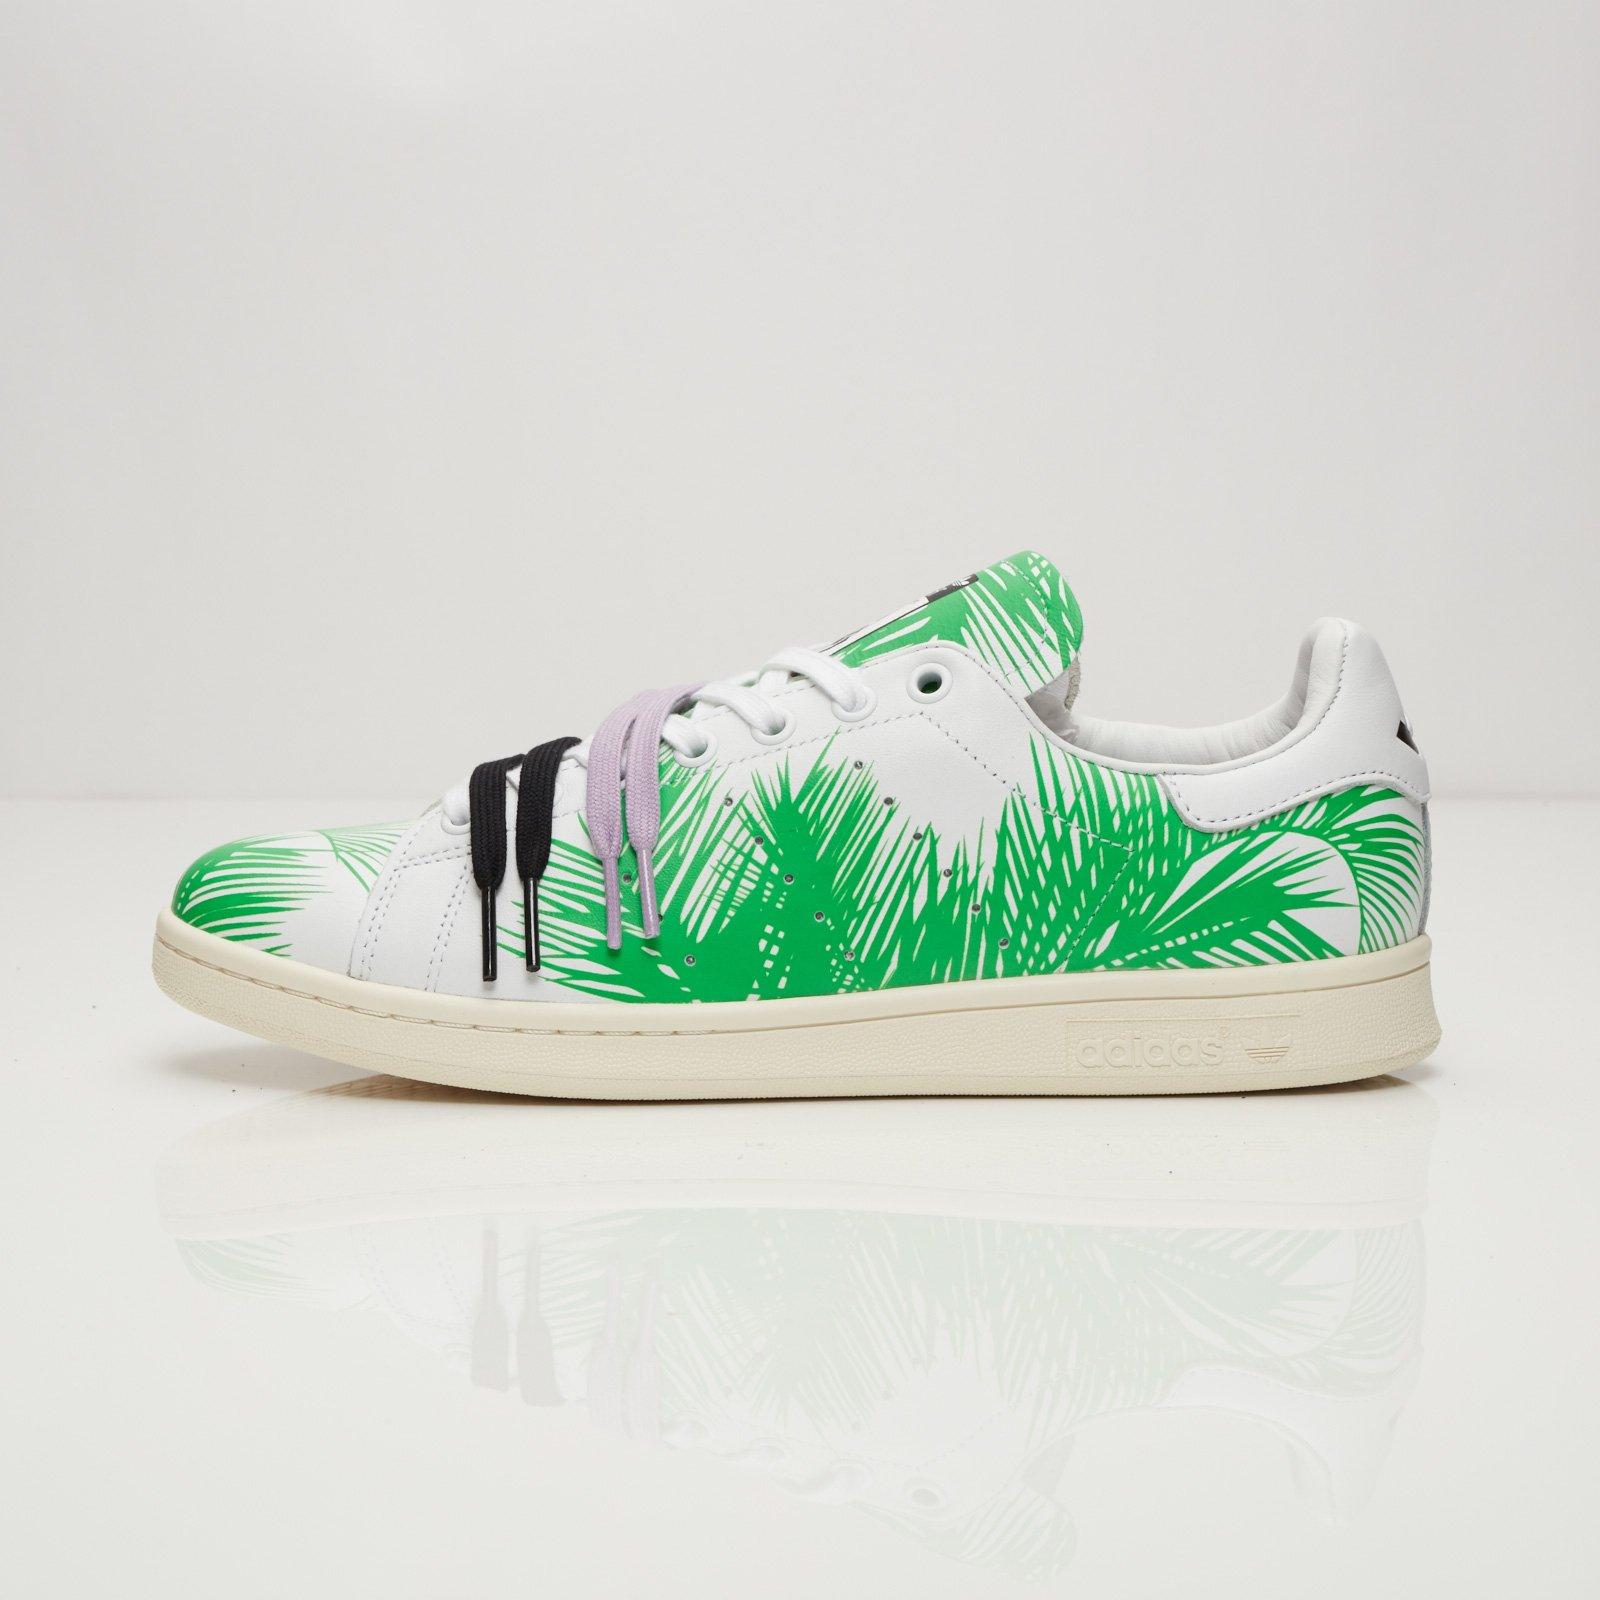 7585e8f87f473 adidas PW Stan Smith BBC Palm Tree - S82071 - Sneakersnstuff ...